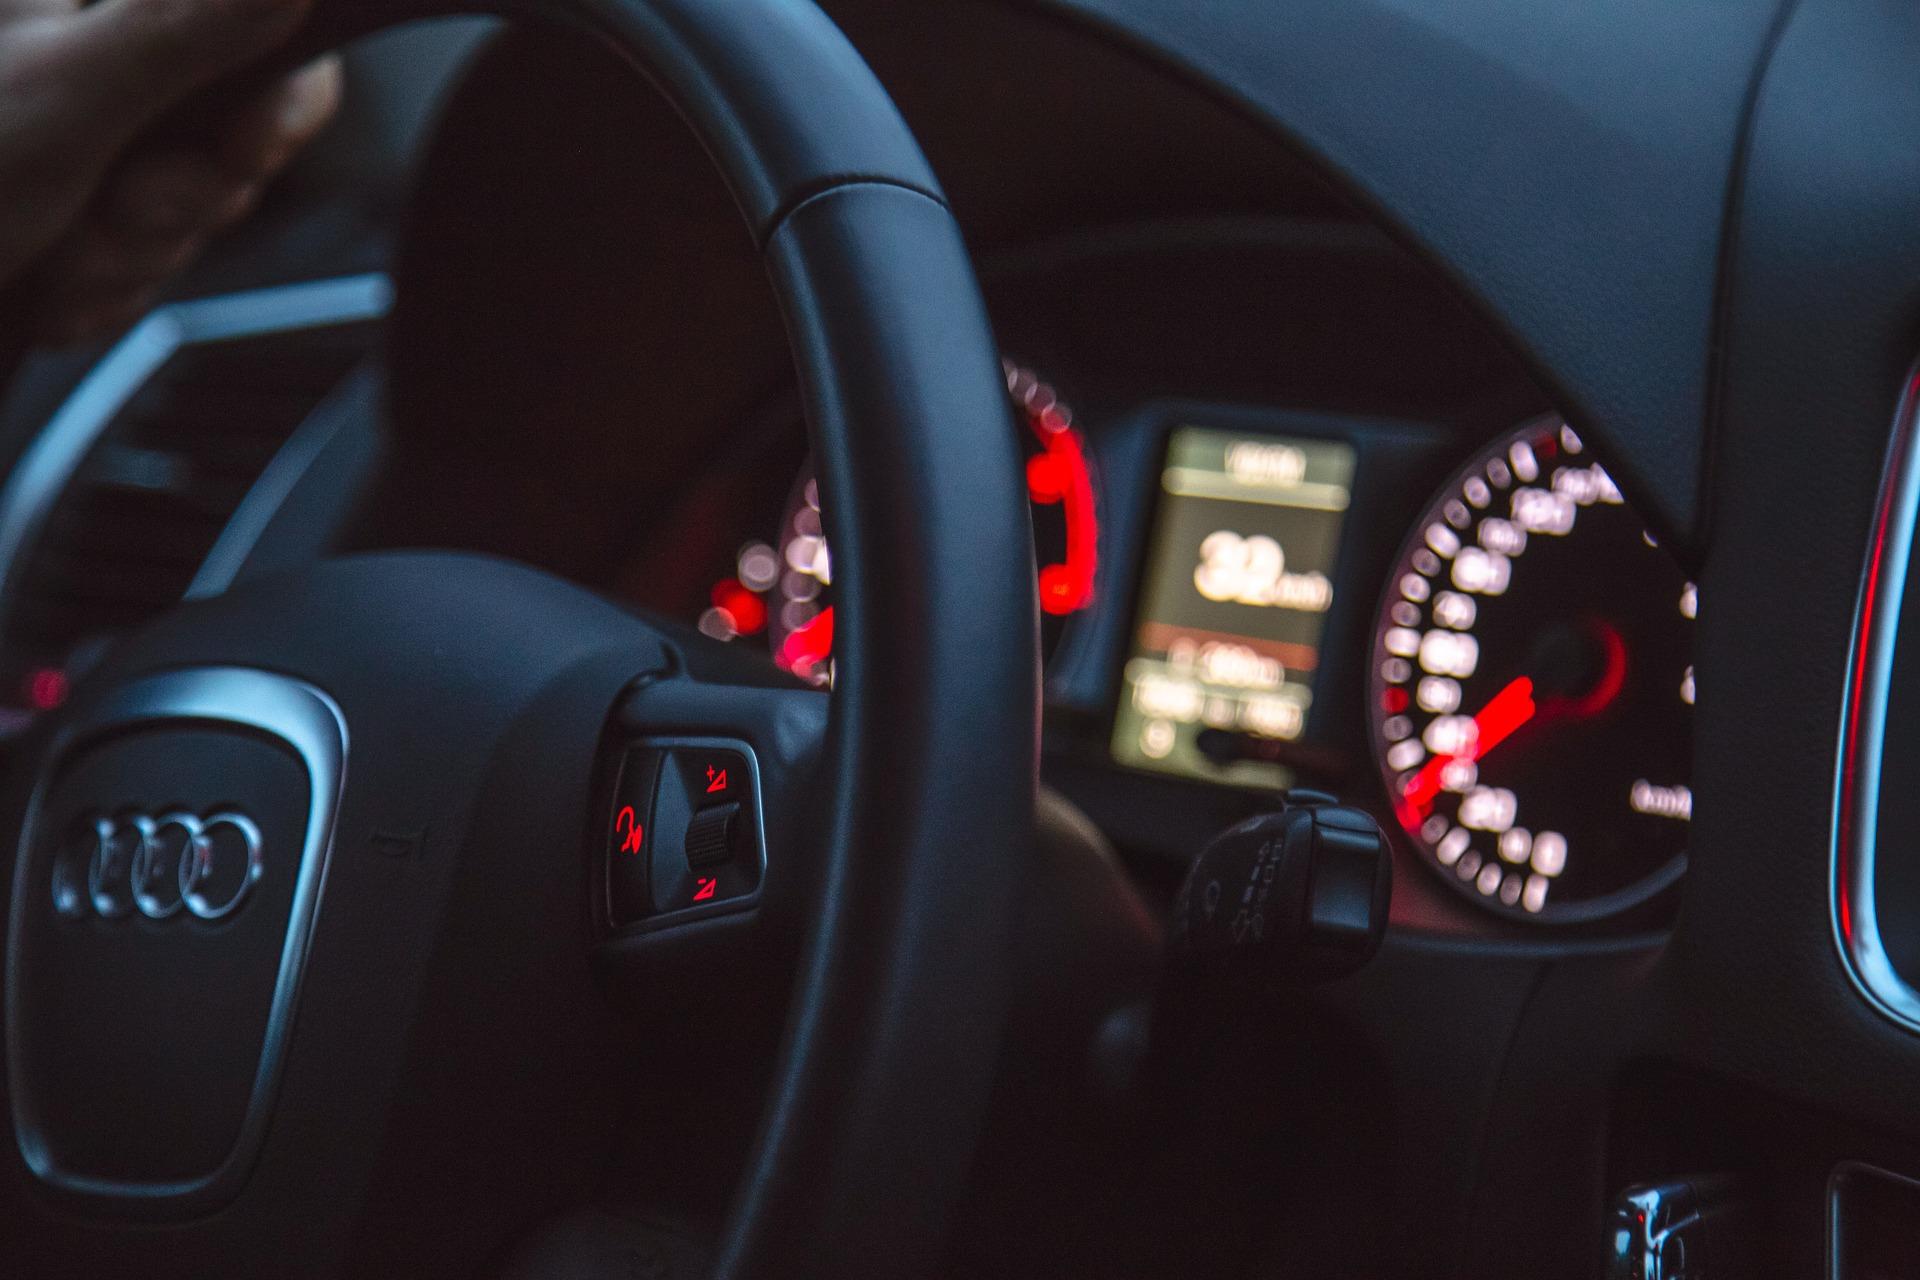 Audi LPG interieur - Agin BV